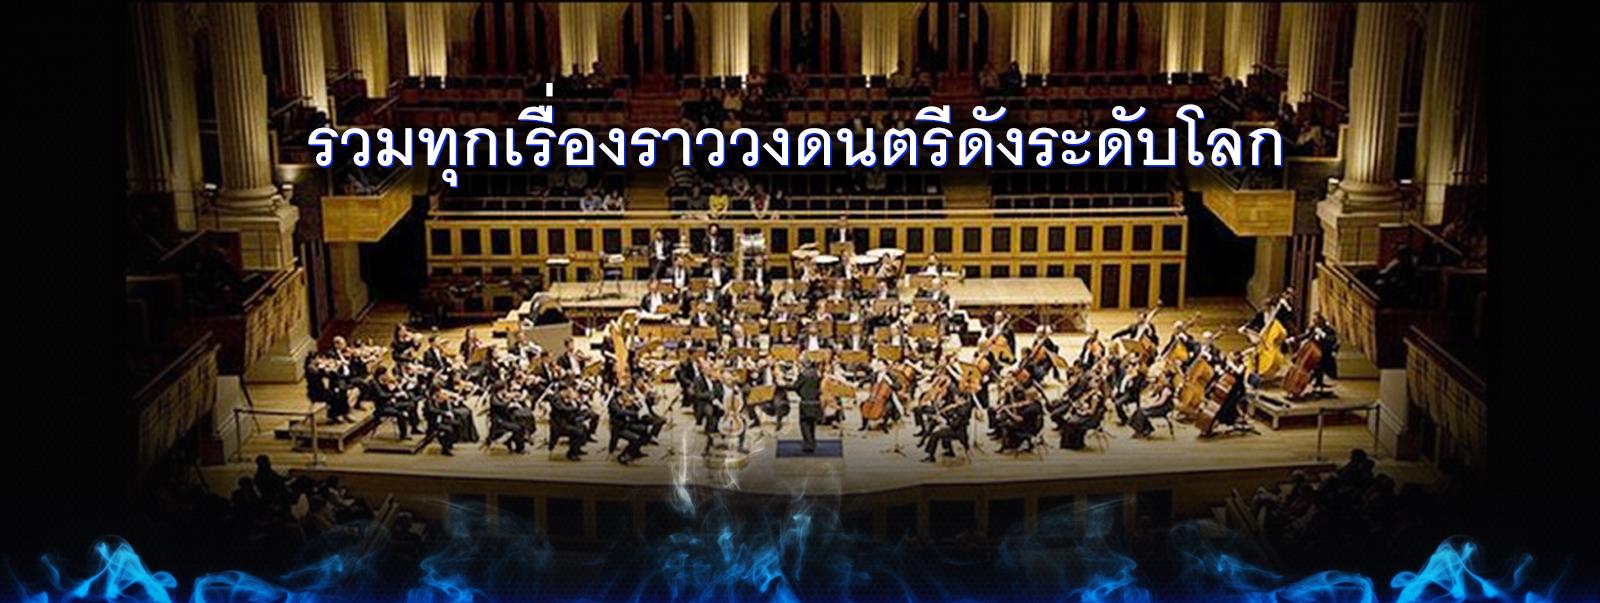 symphony วงดนตรีคลาสสิคระดับโลก